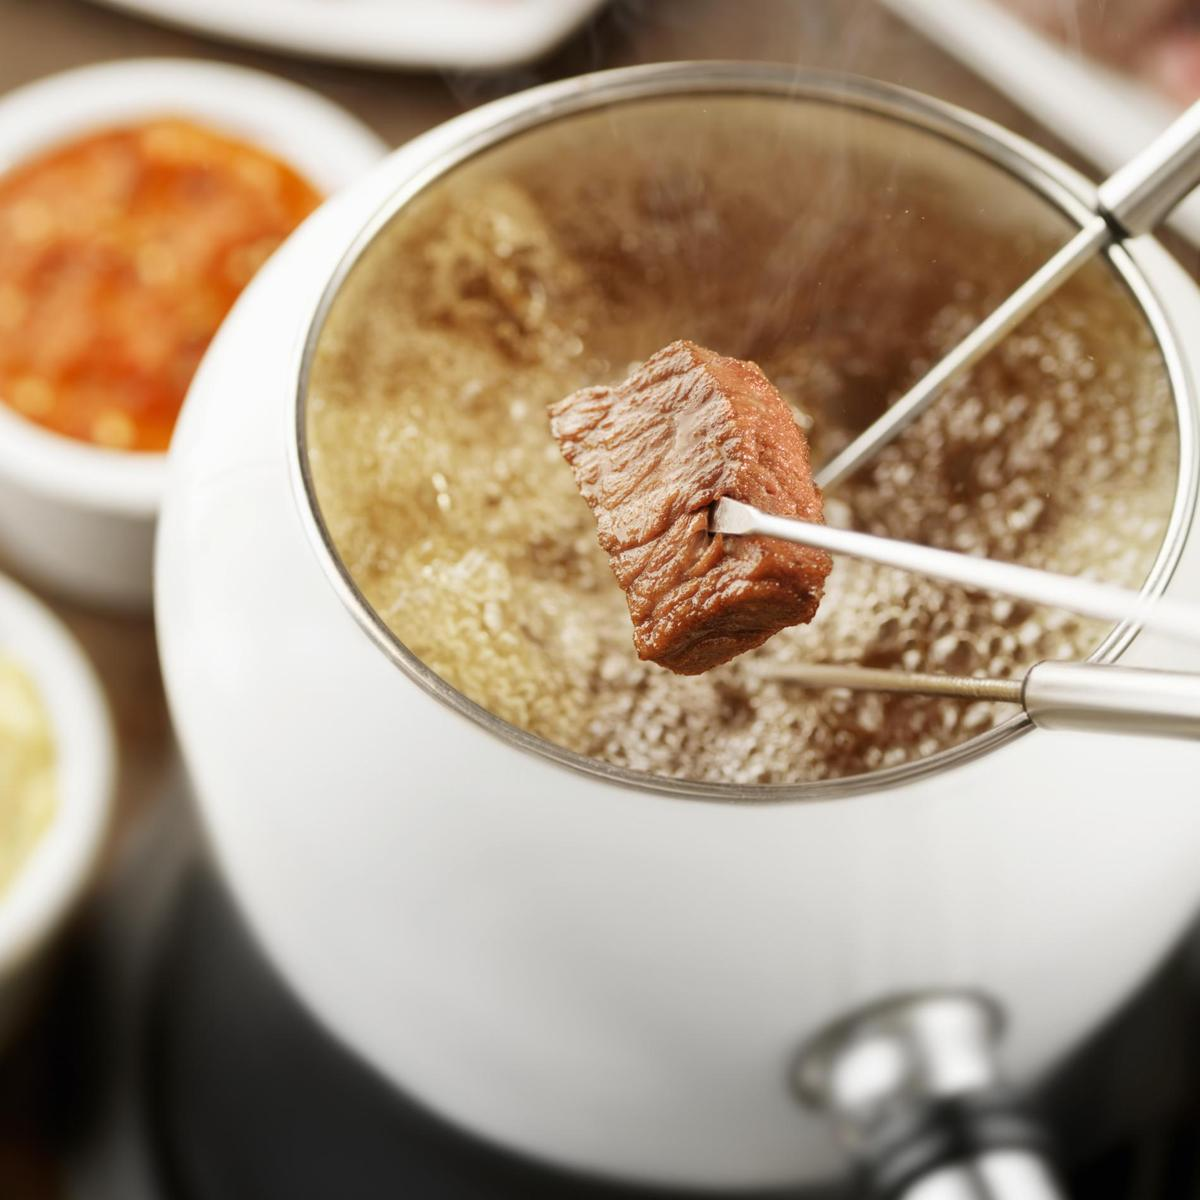 Recette fondue bourguignonne cuisine madame figaro - Cuisine bourguignonne ...